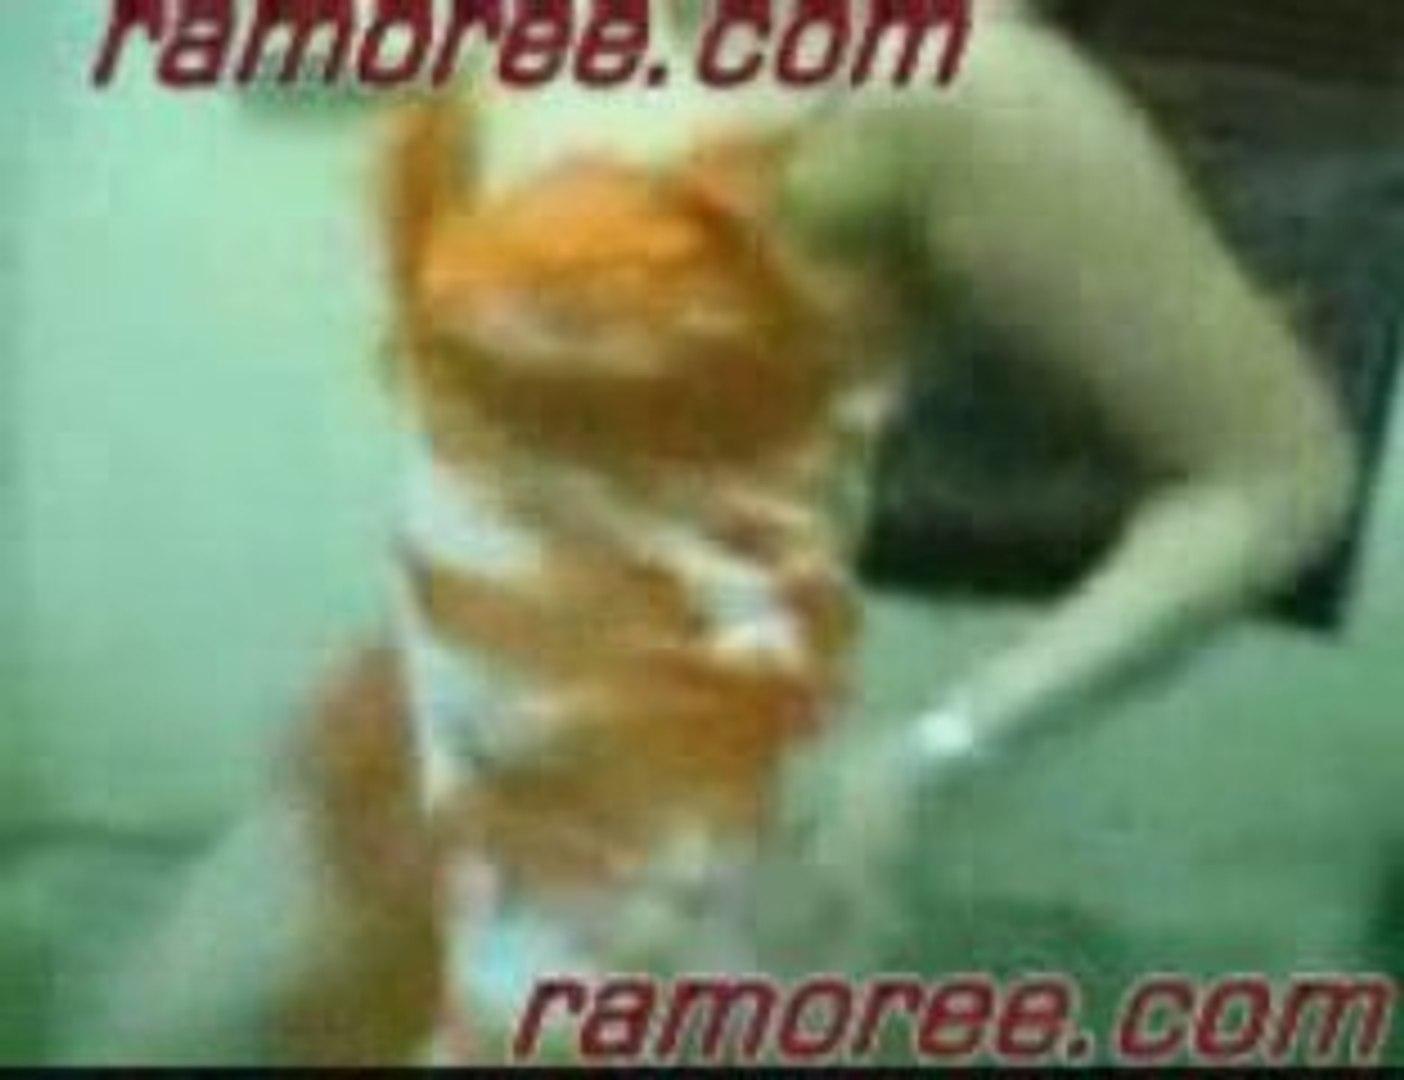 رقص بقميص النوم رقص مصري www.ramoree....